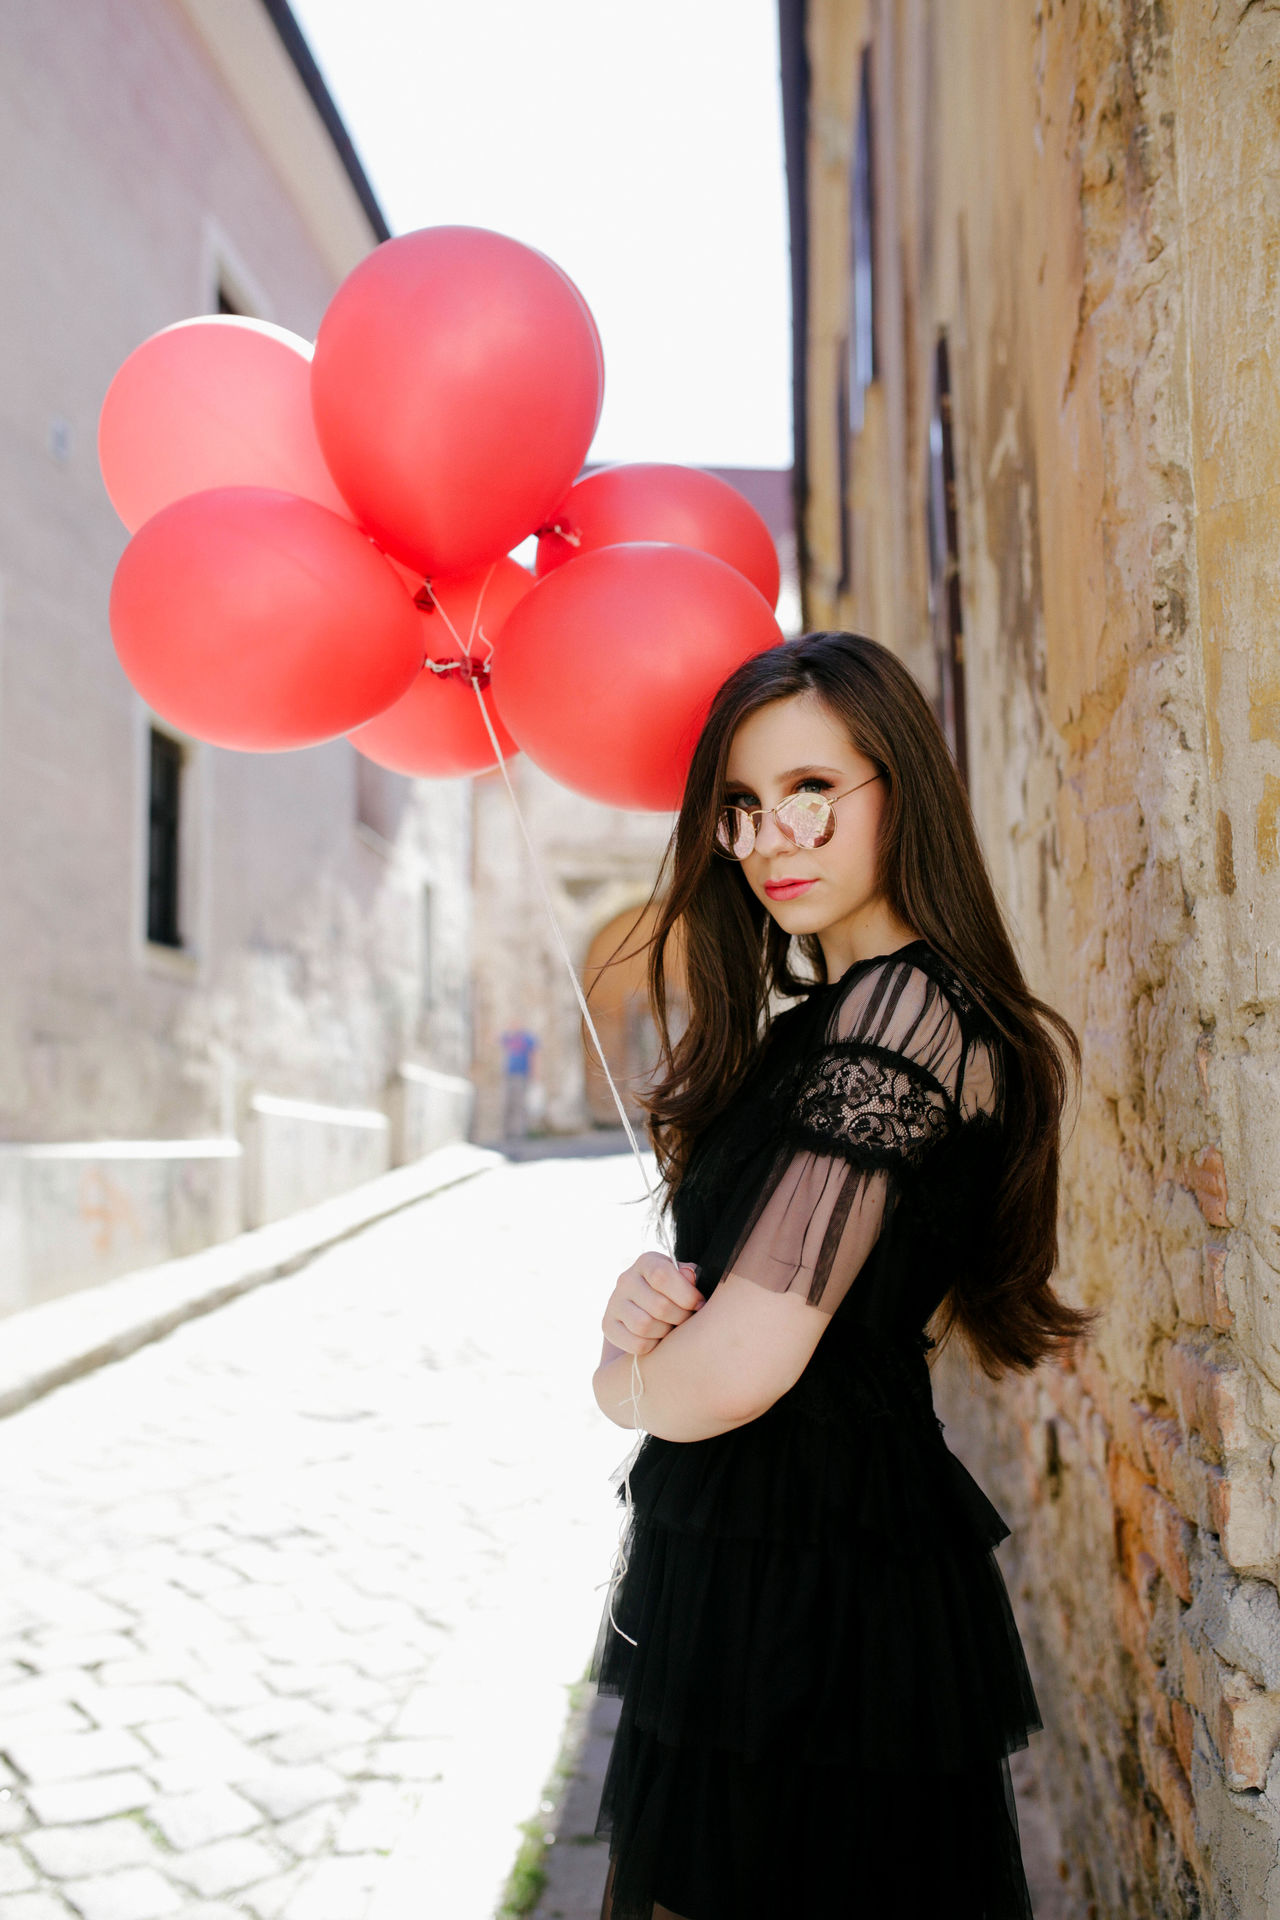 Balloons Beauty Fashion Girl Lifestyles Portrait The Portraitist - 2017 EyeEm Awards Woman